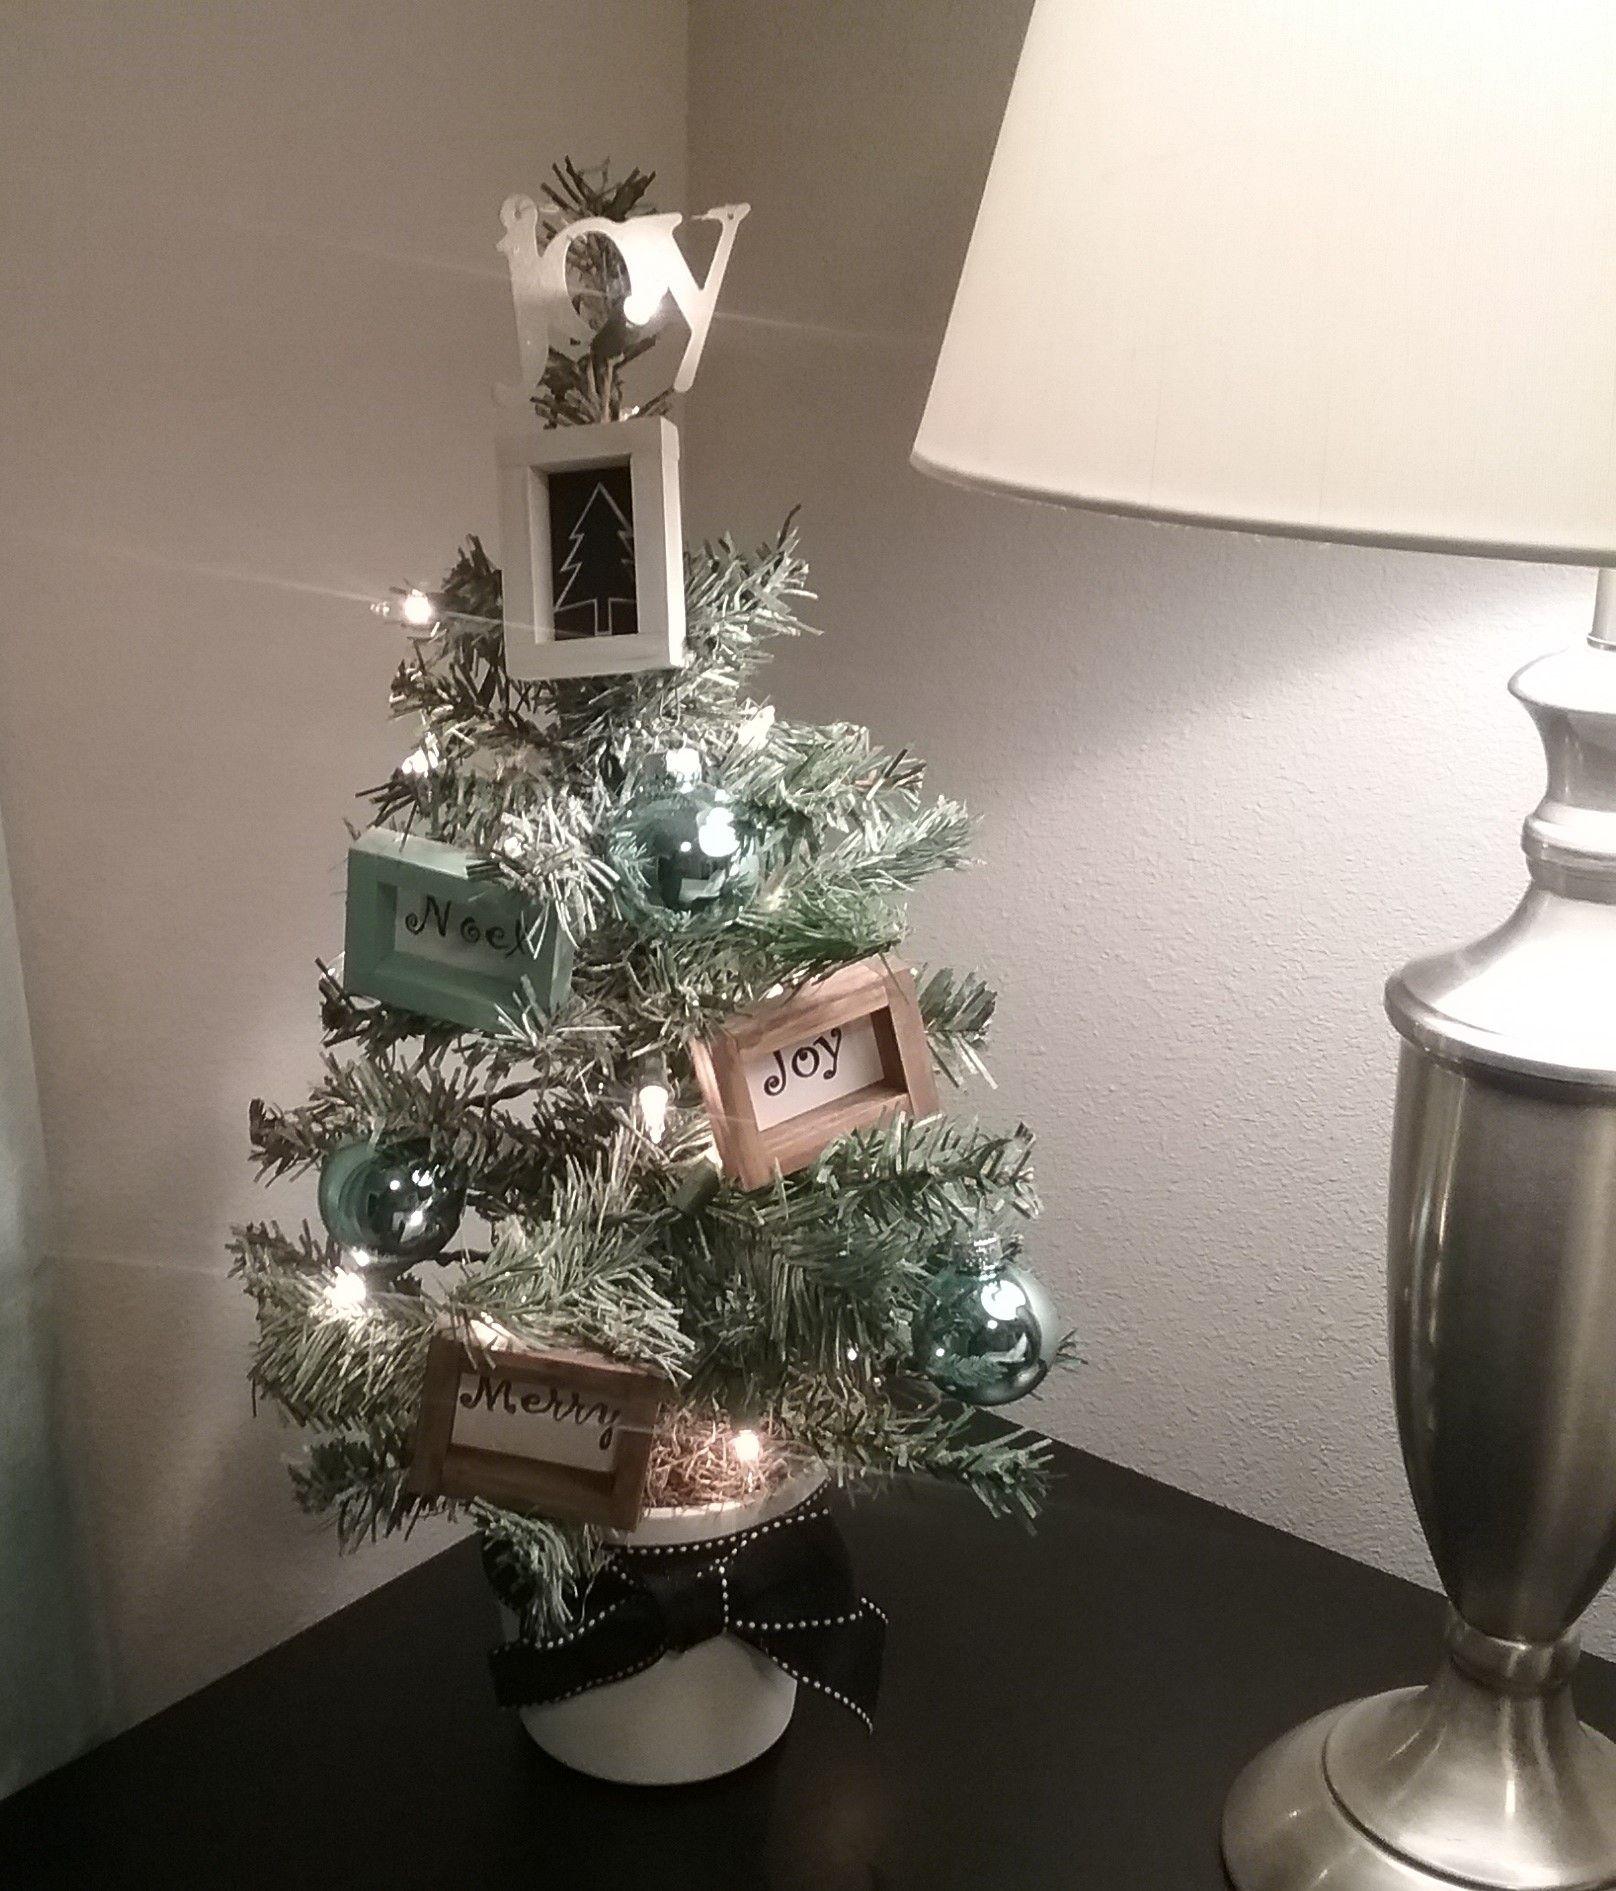 Mini Black Christmas Tree: I Used A Dollar Tree Mini Tree With Added Pieces Of Dollar